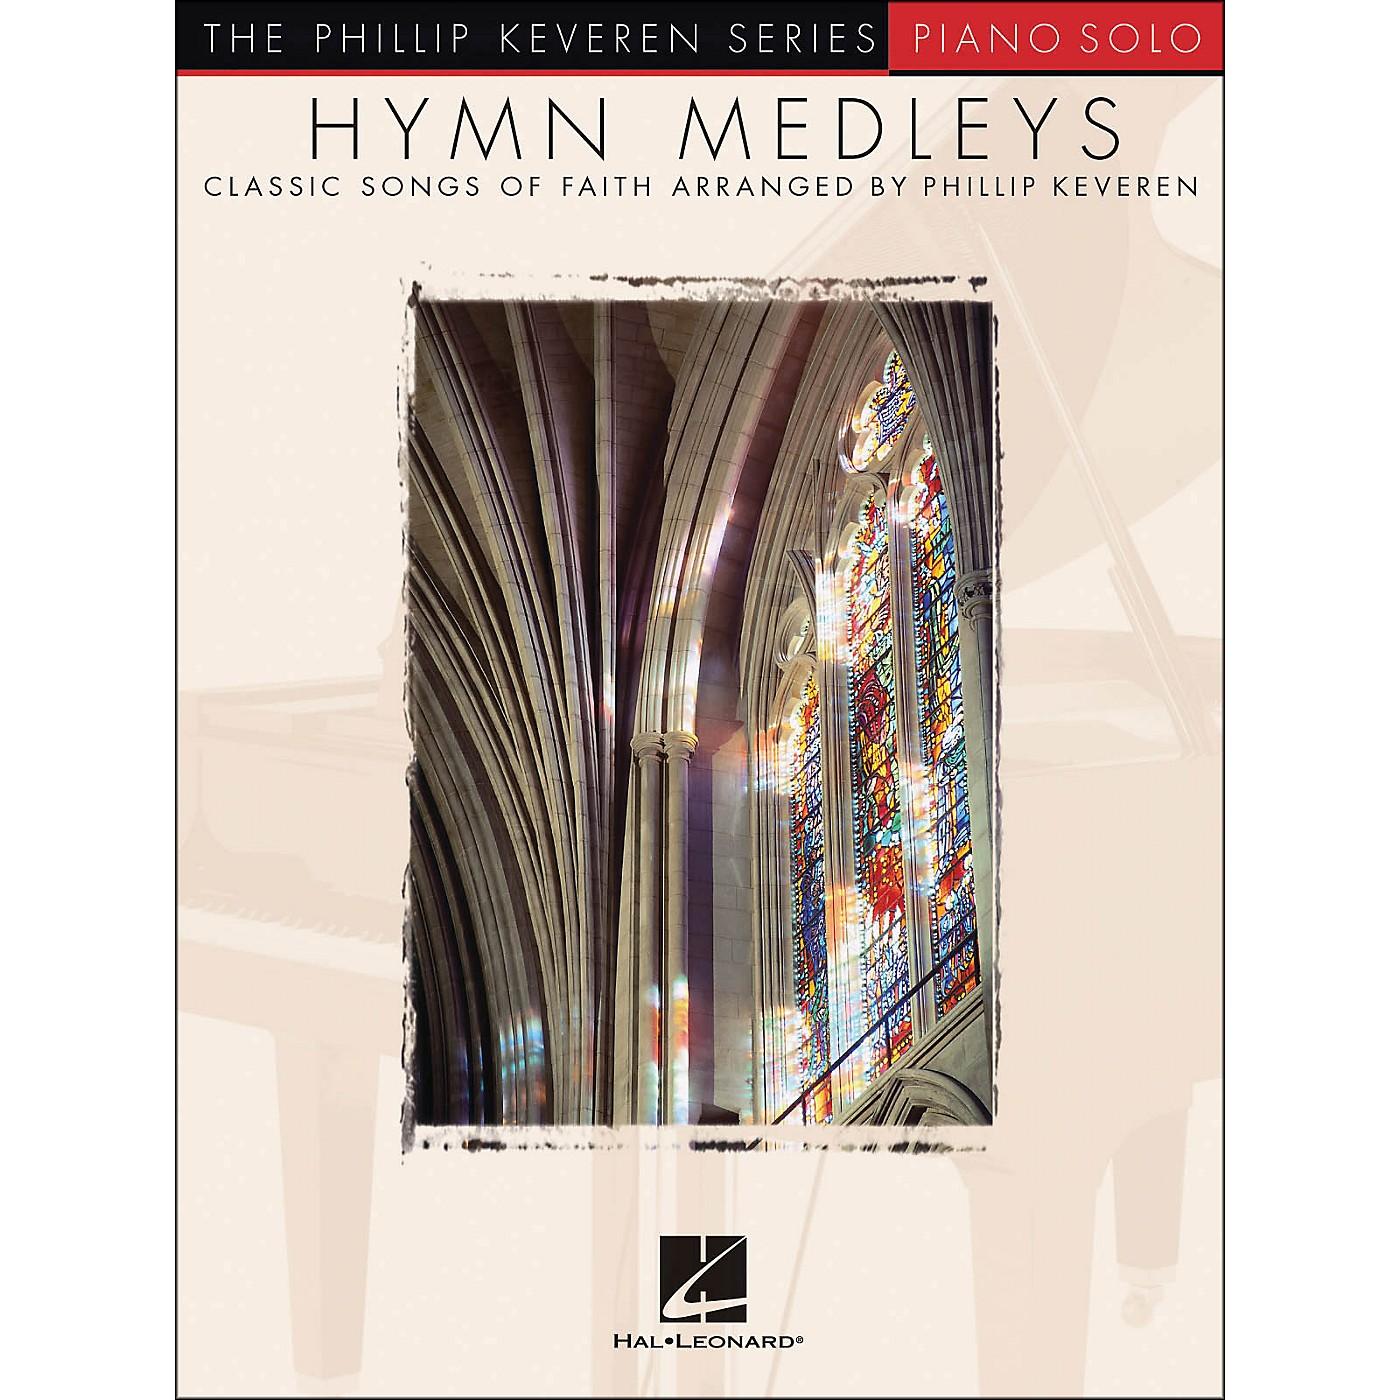 Hal Leonard Hymn Medleys - Piano Solo By Phillip Keveren Series thumbnail